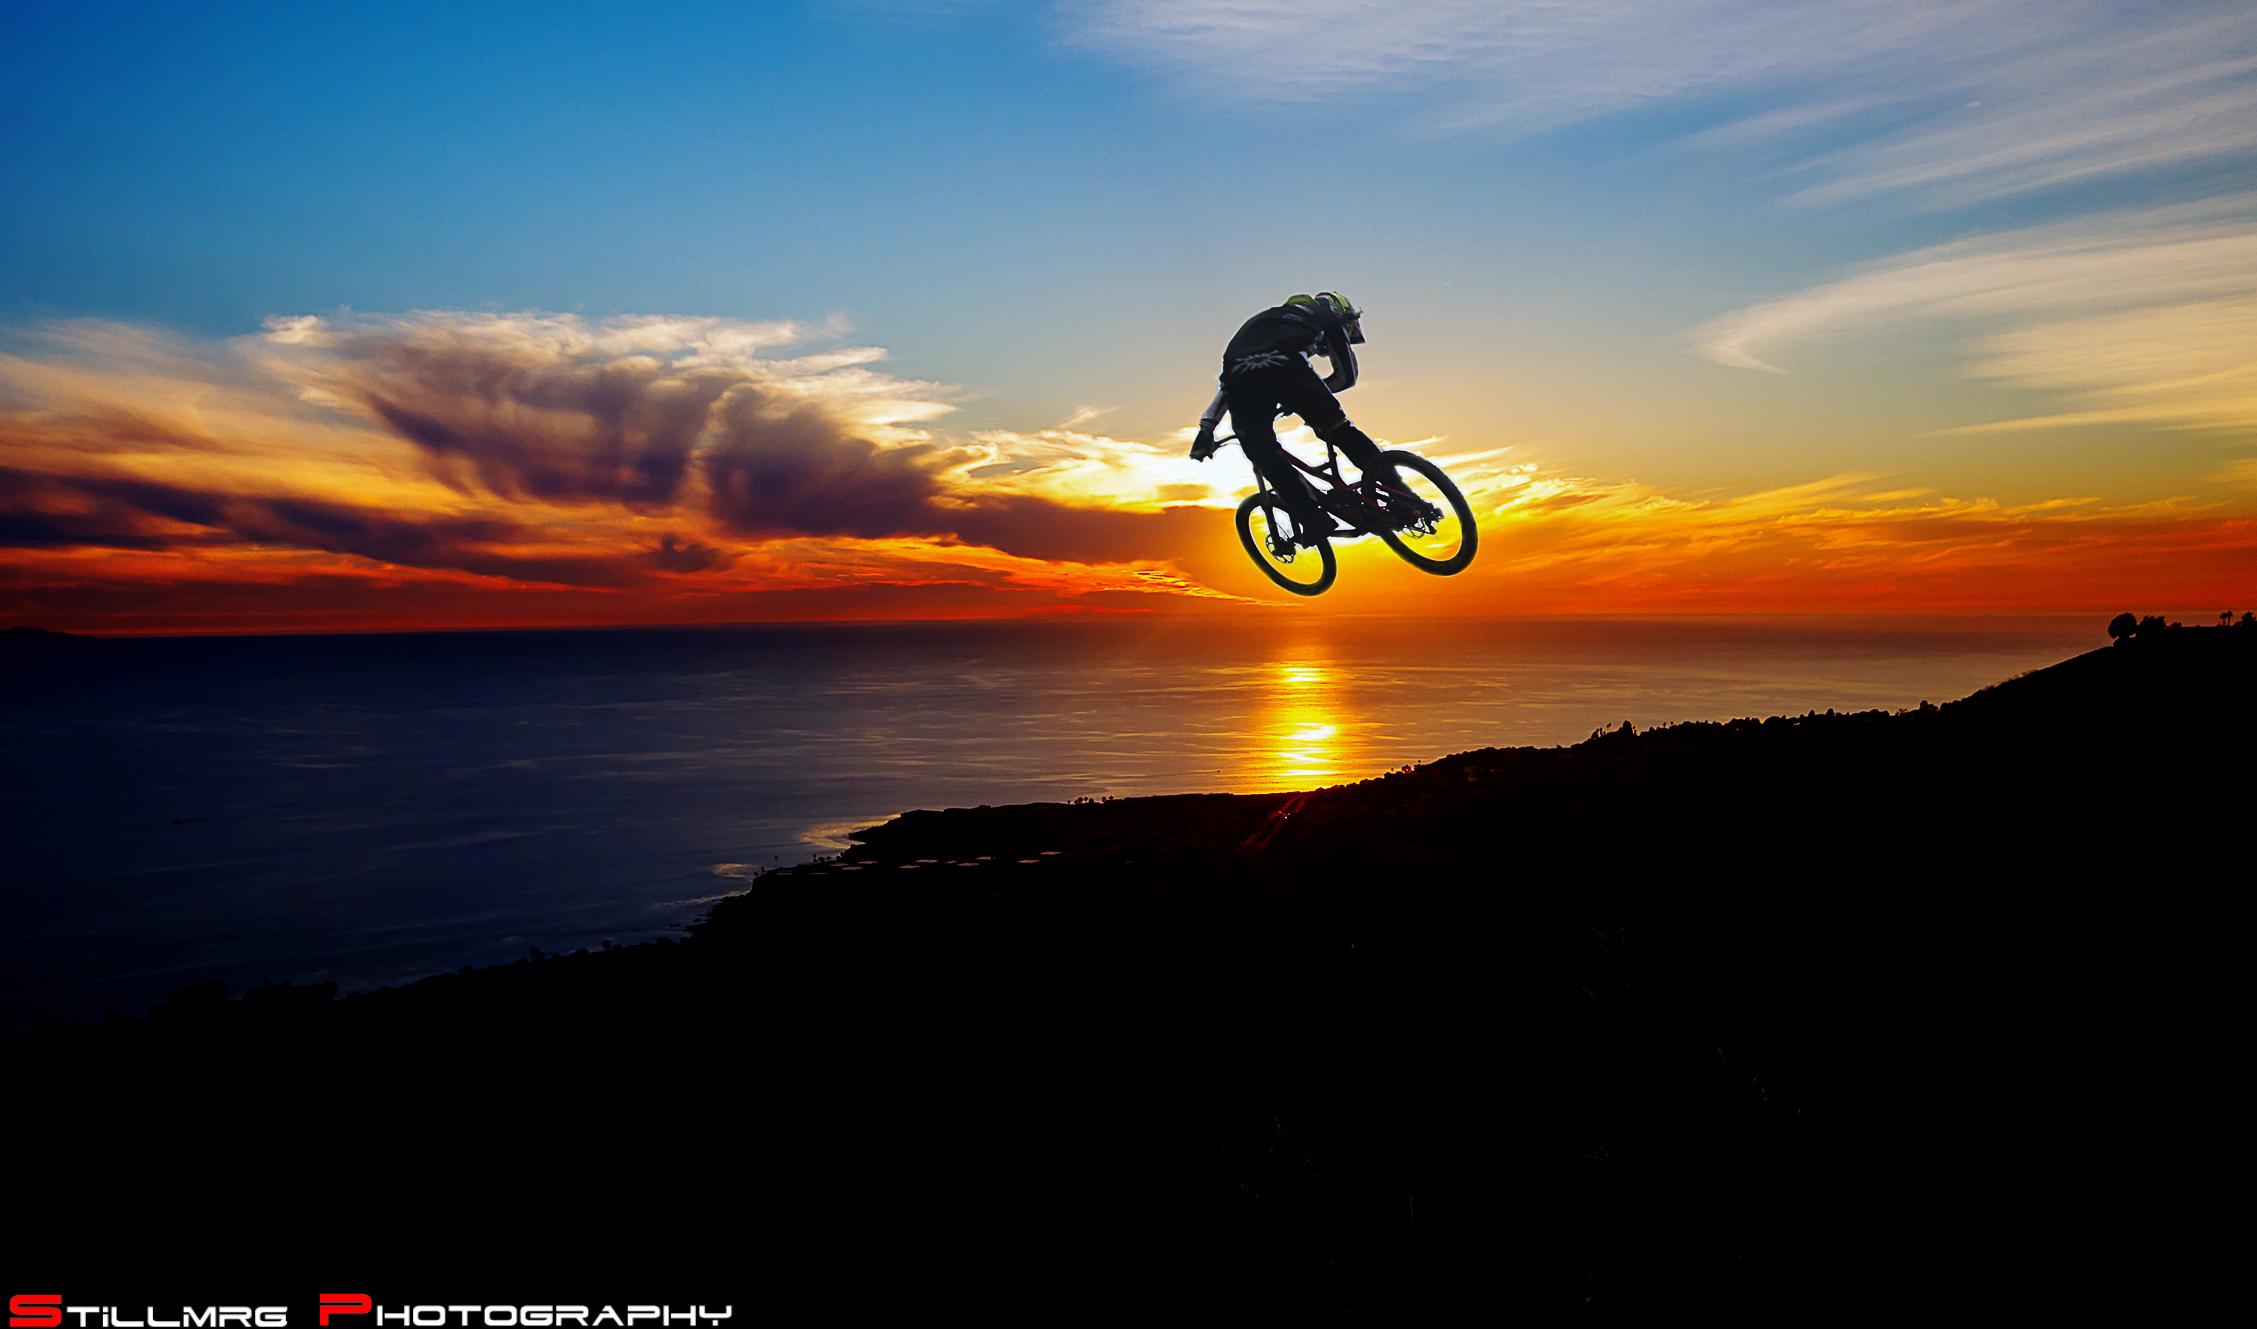 How I Love Cal Sunset Stillmrg Photography Mountain